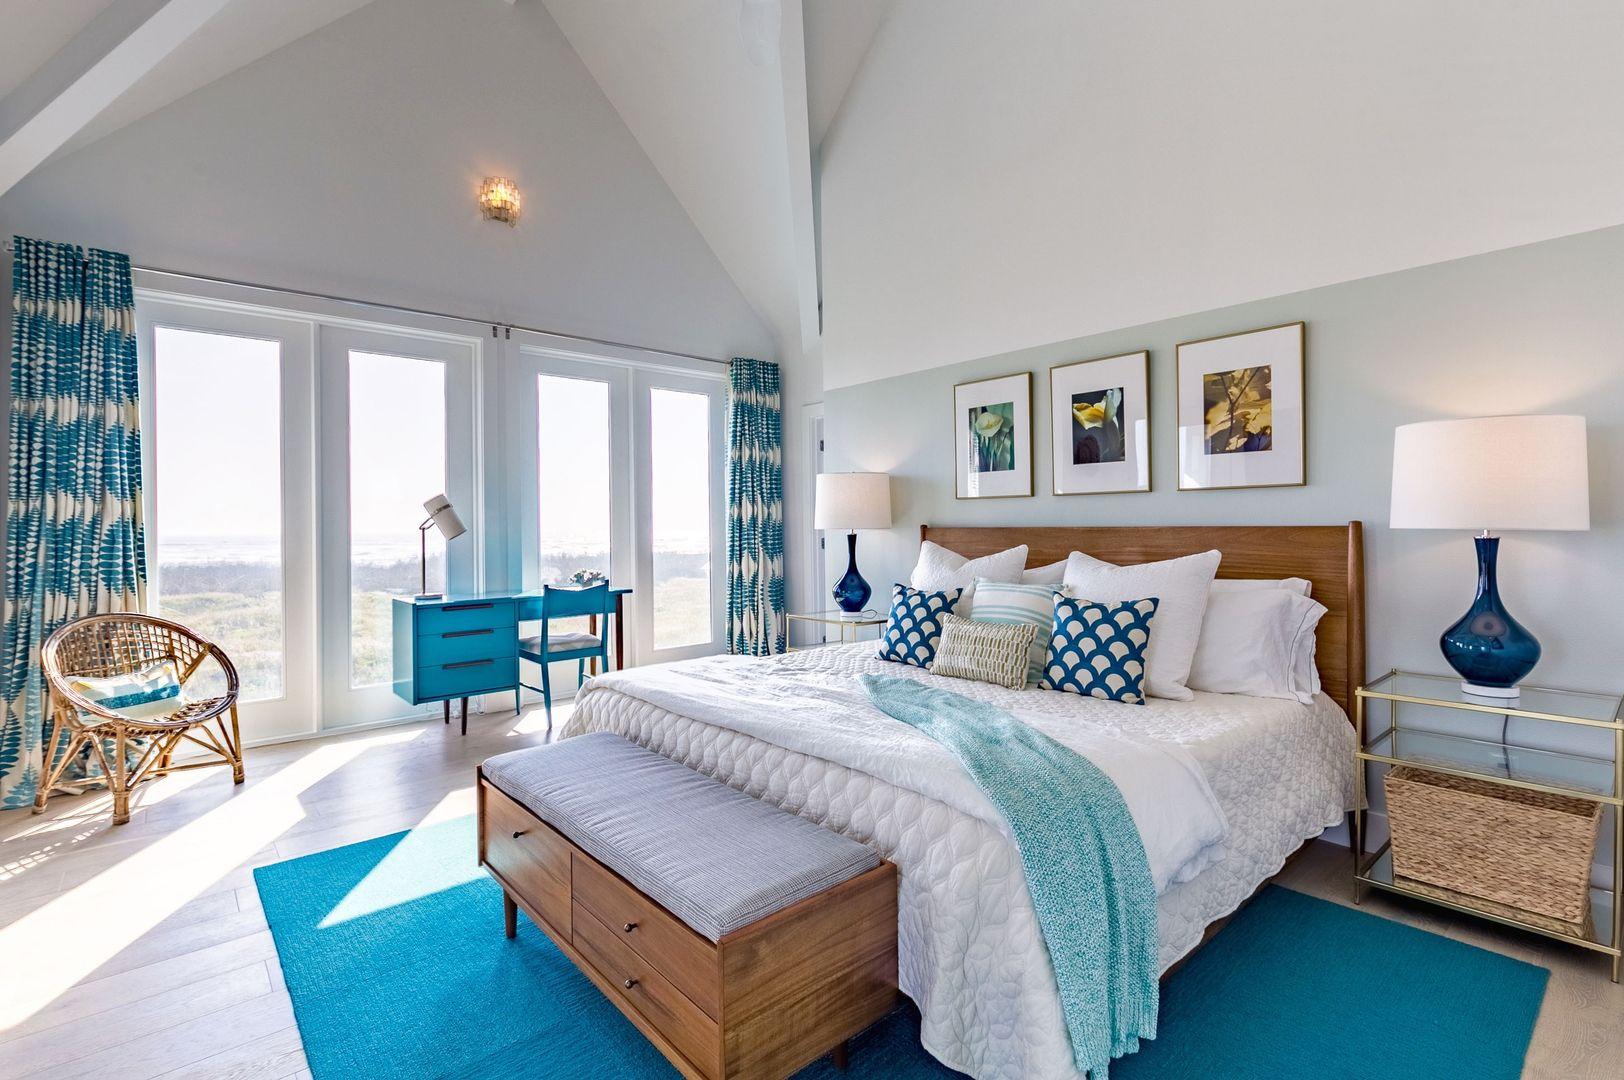 Teal, Turquoise And Aloe Beach House Bedroom. Modern Beach